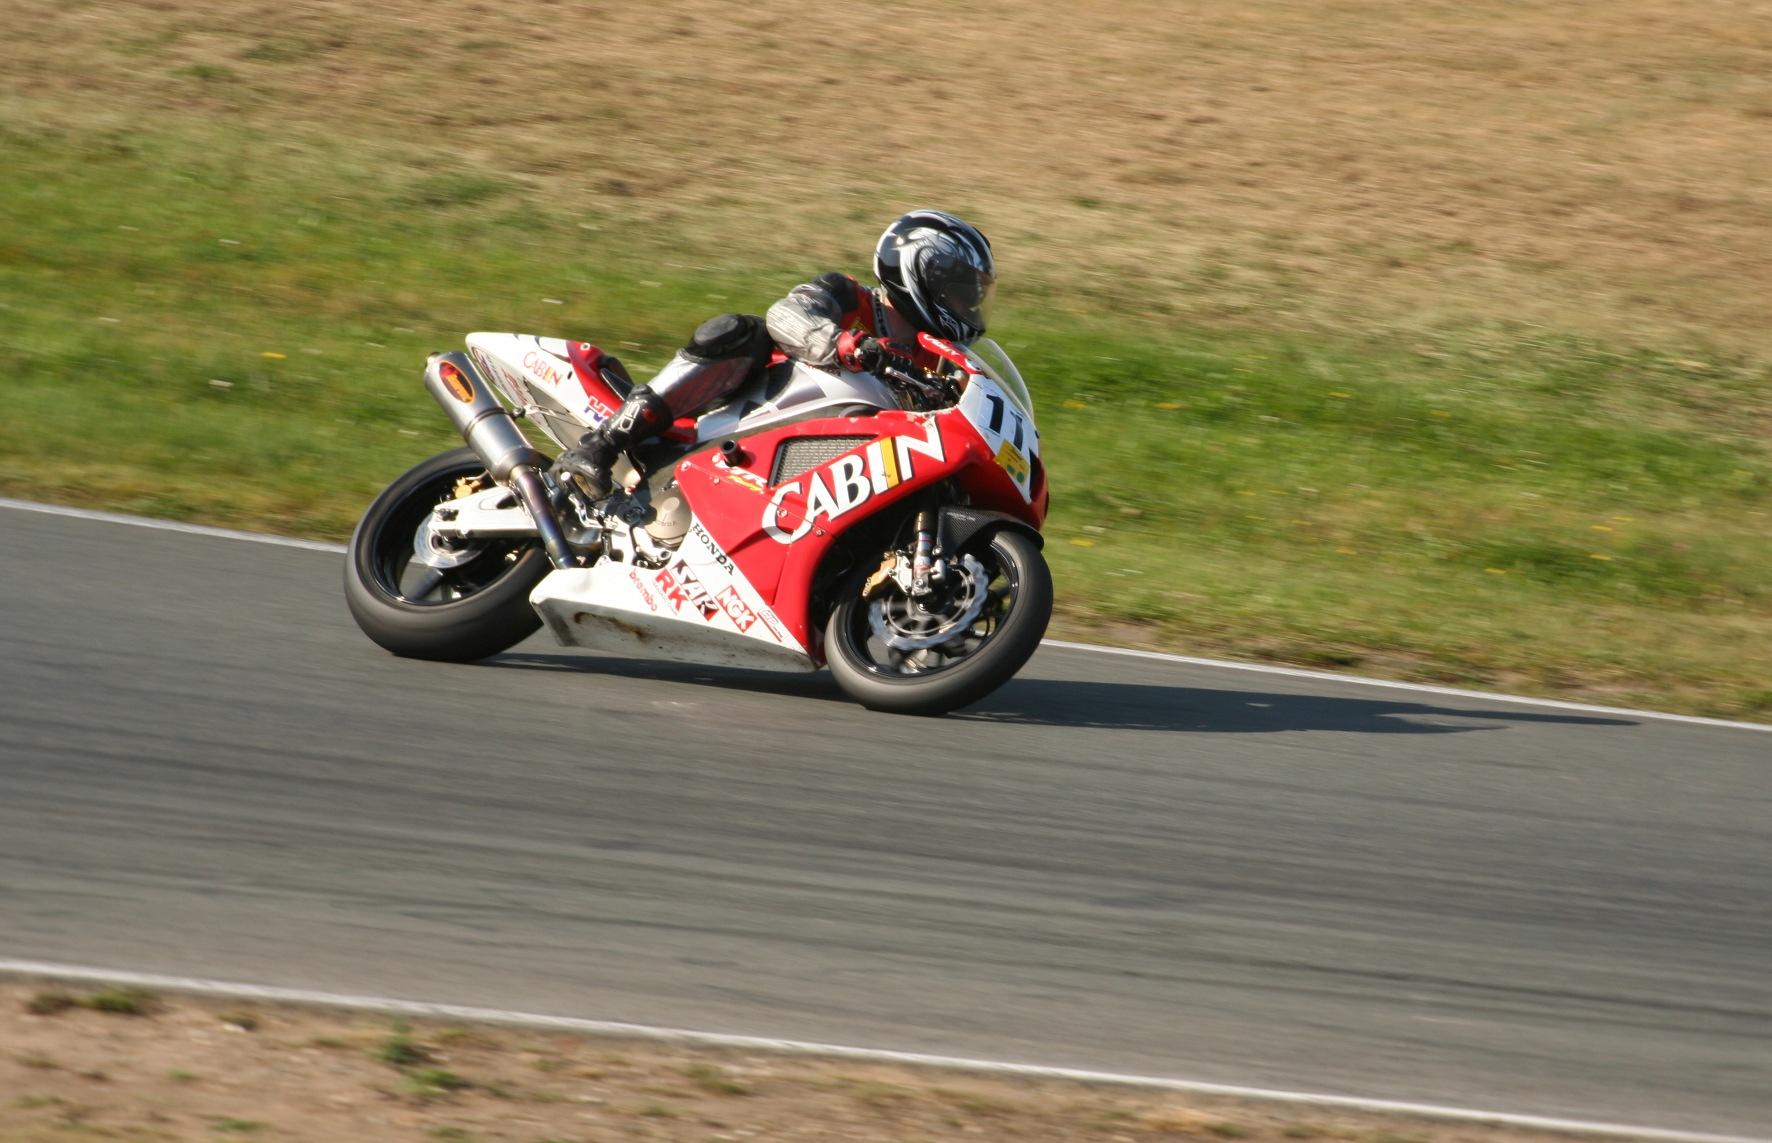 http://www.xs4all.nl/~nsie/bike/2009/Ossie/IMG_9390.JPG